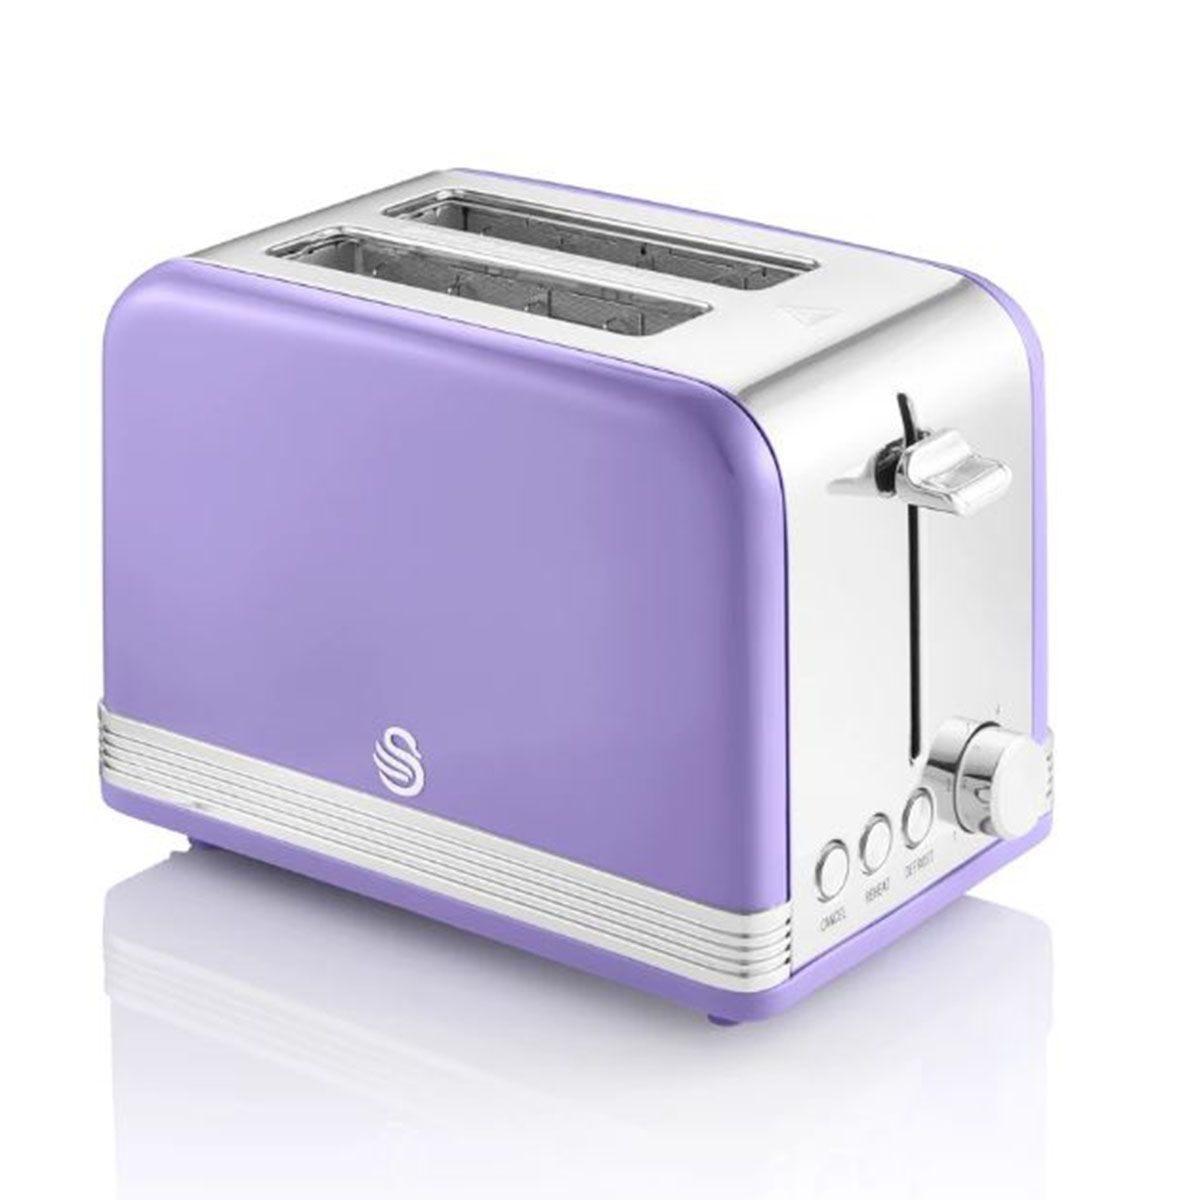 Swan ST19010PURN 815W 2 Slice Retro Toaster - Purple